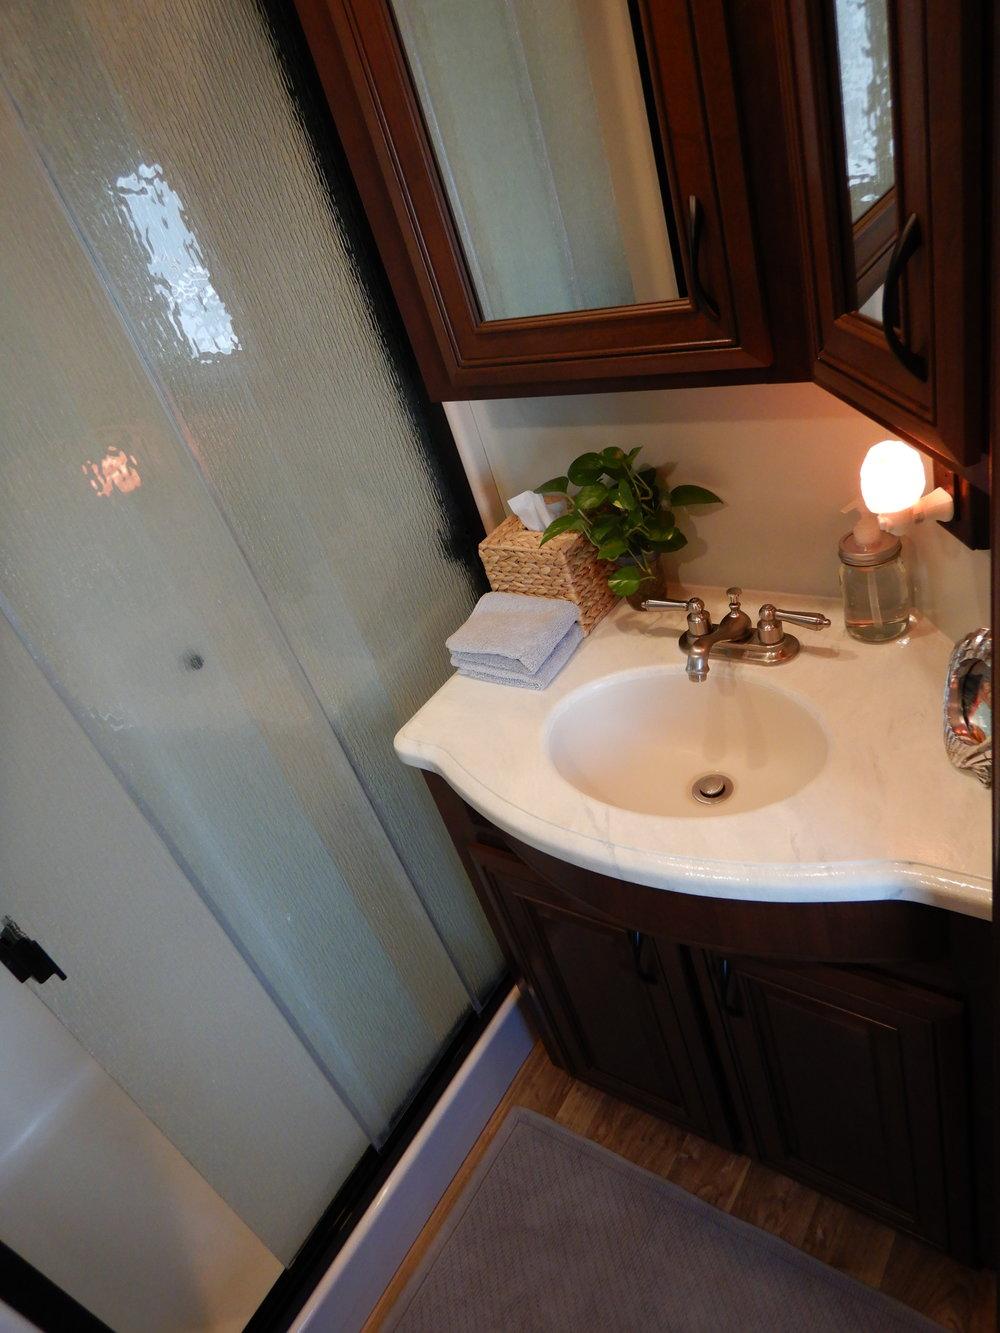 RV Bathroom_After.JPG